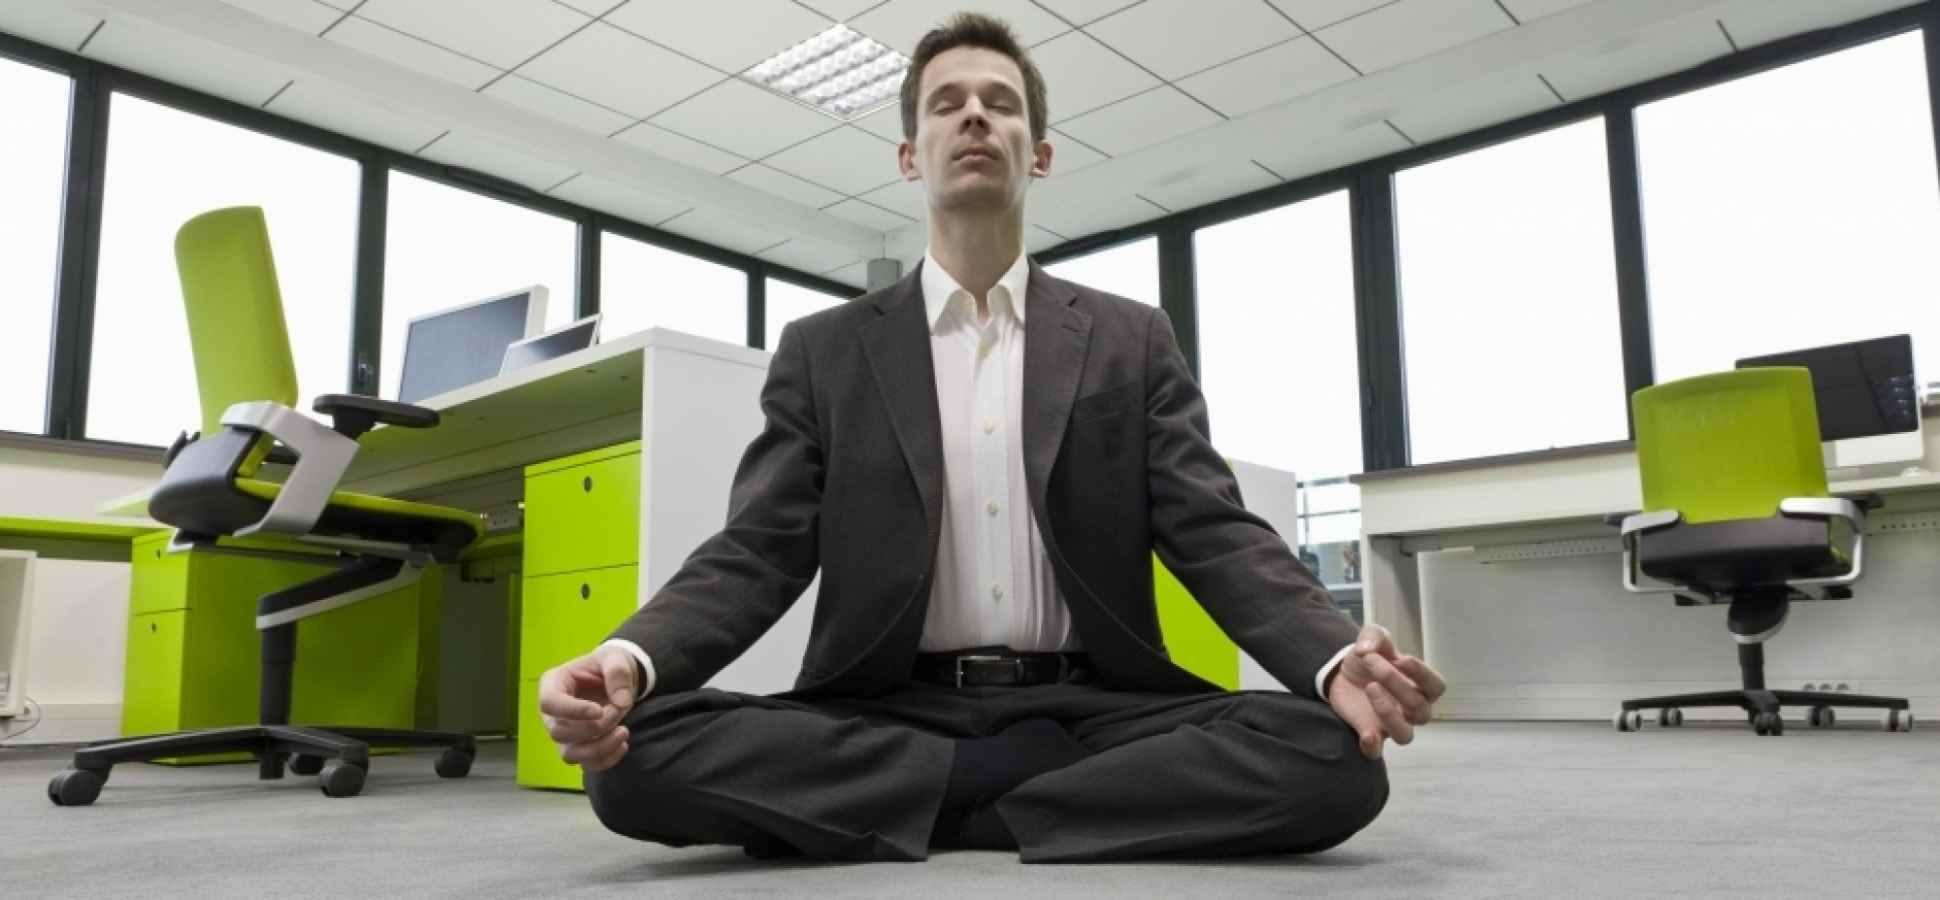 The Integration of Technology, Mindfulness, and Meditation for Entrepreneurs